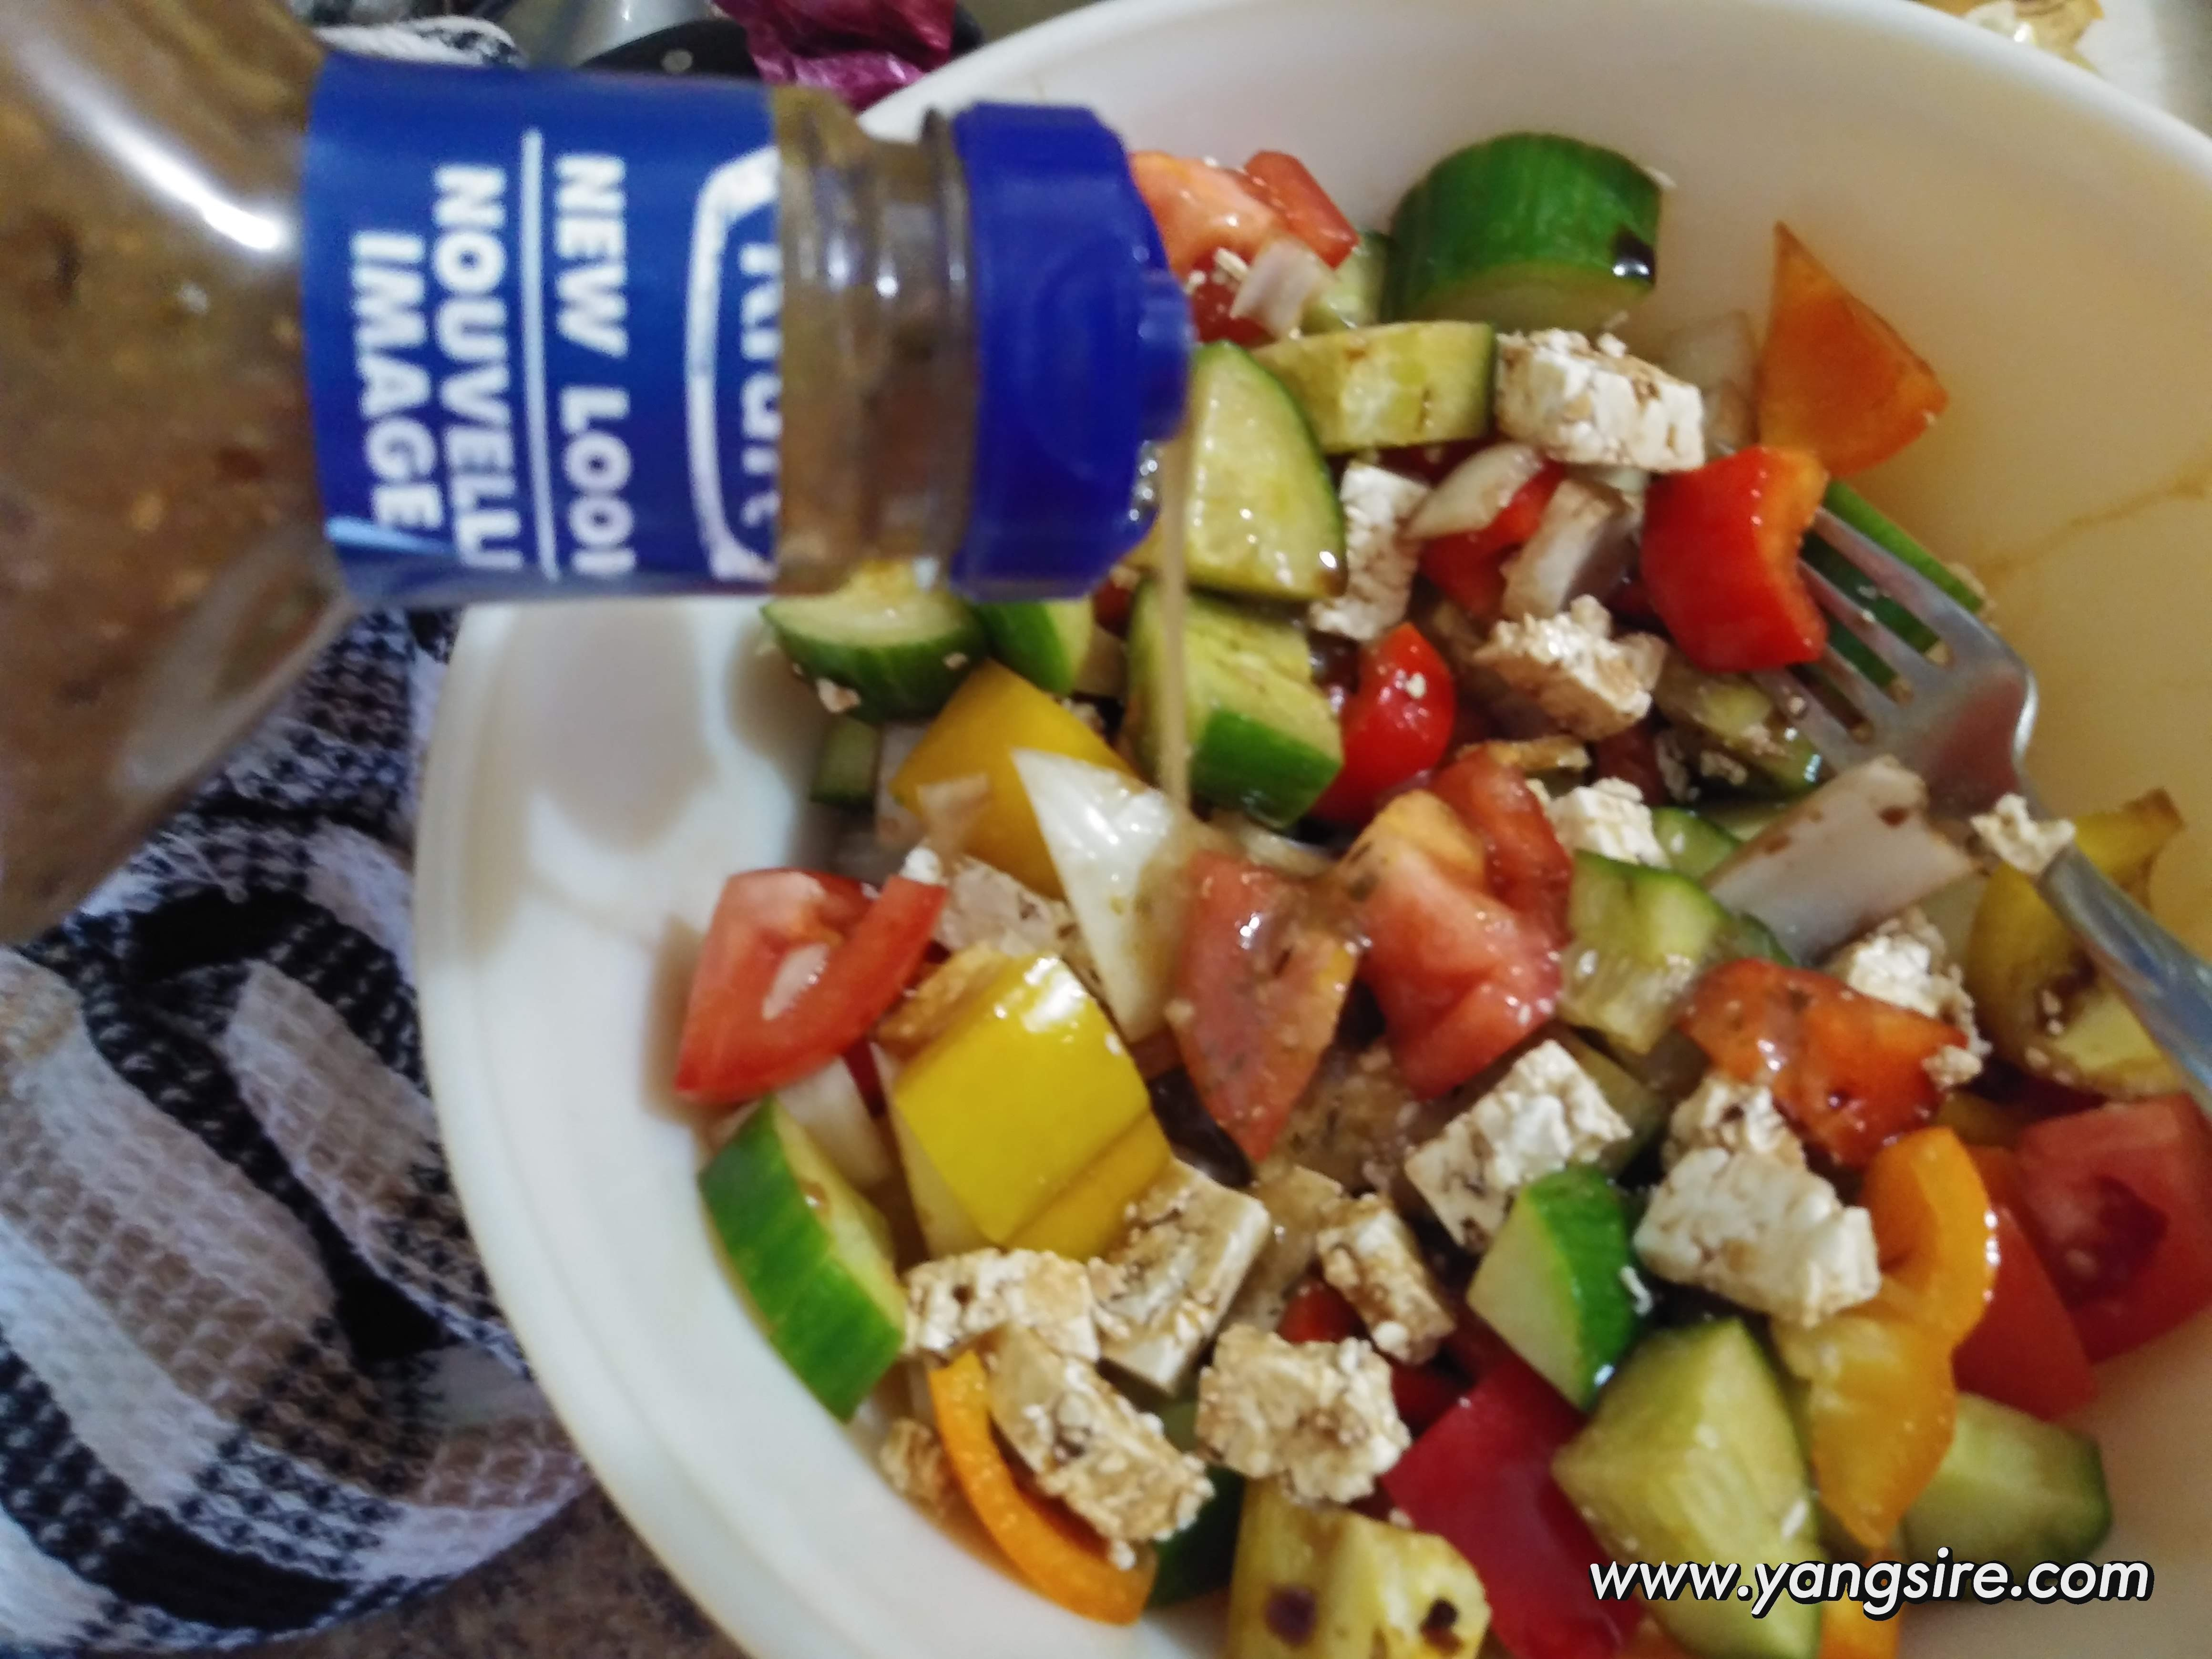 Putting Kraft Greek Feta Dressing Salad, just a little touched to adjust the taste.